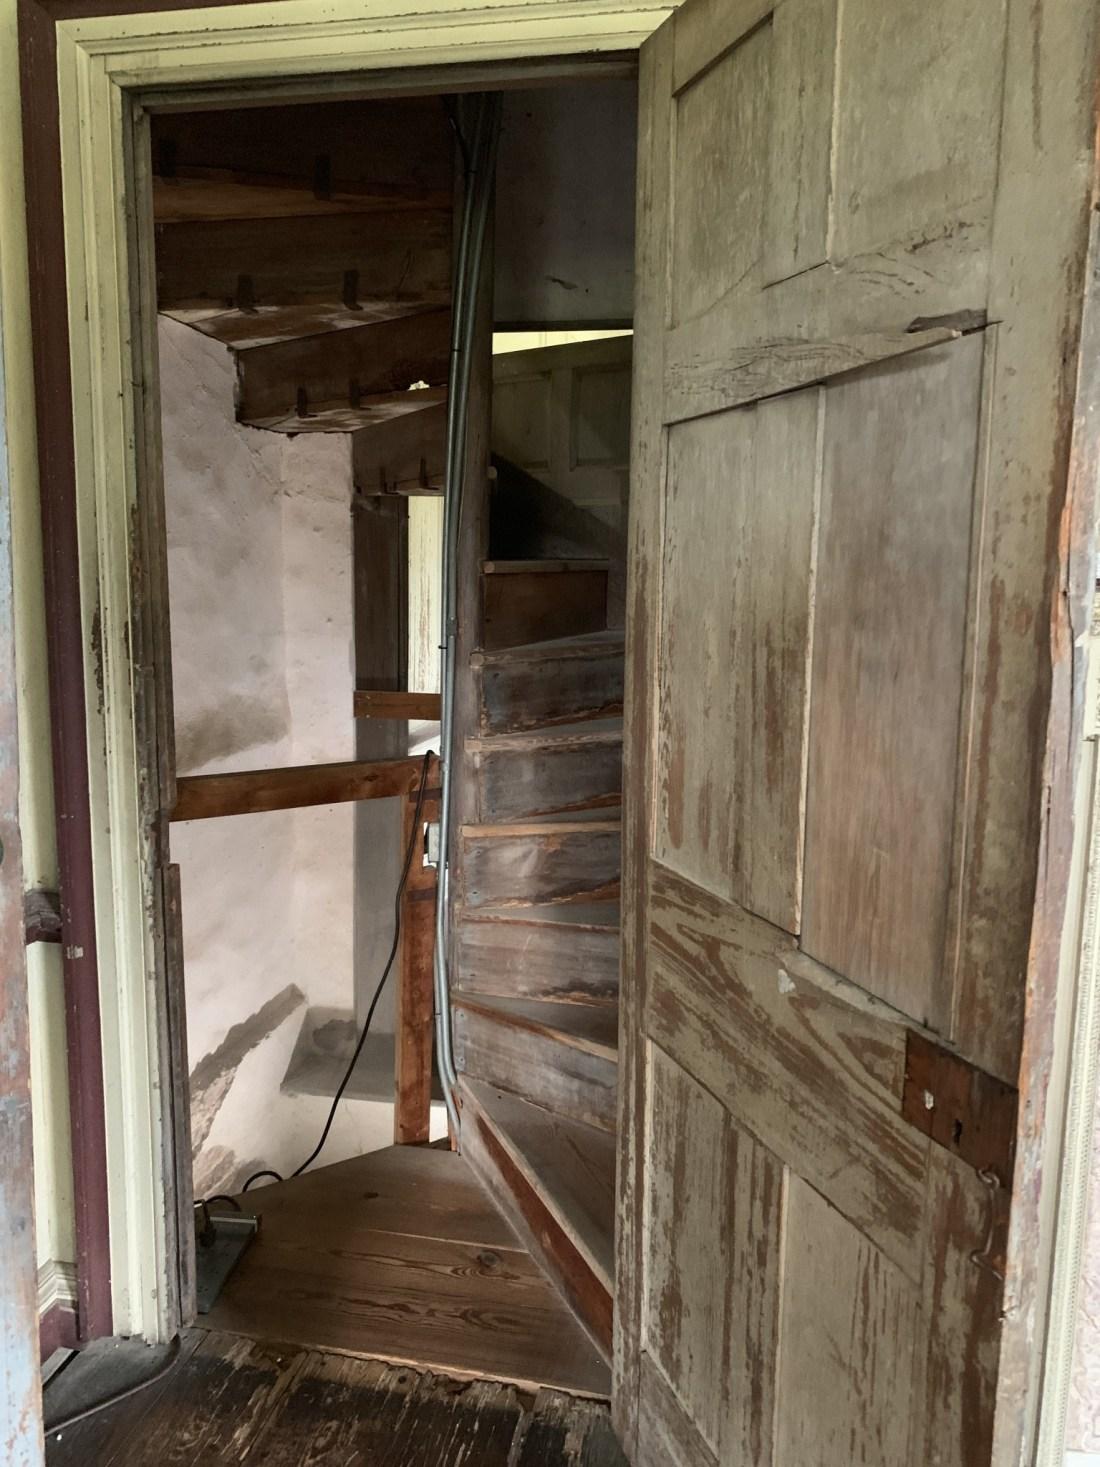 Interior Stairwell Drayton Hall